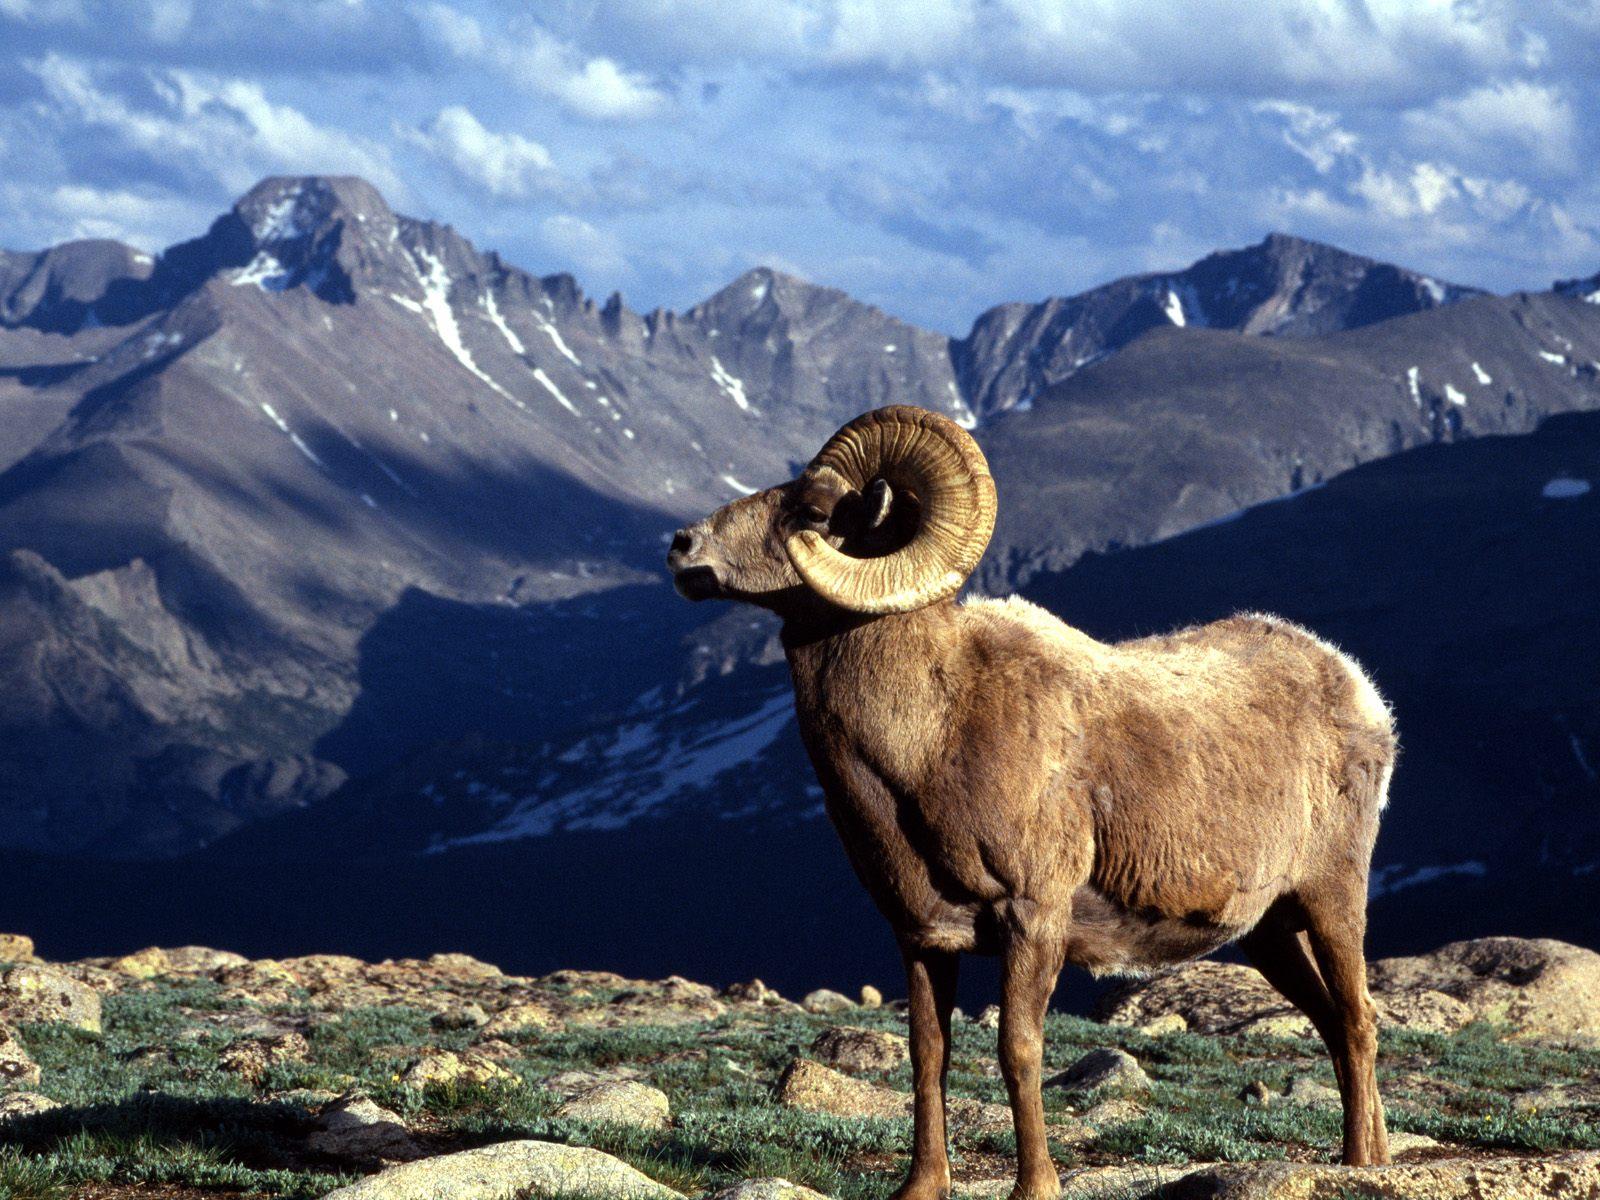 big_horn_ram_rocky_mountain_national_park_colorado.jpg